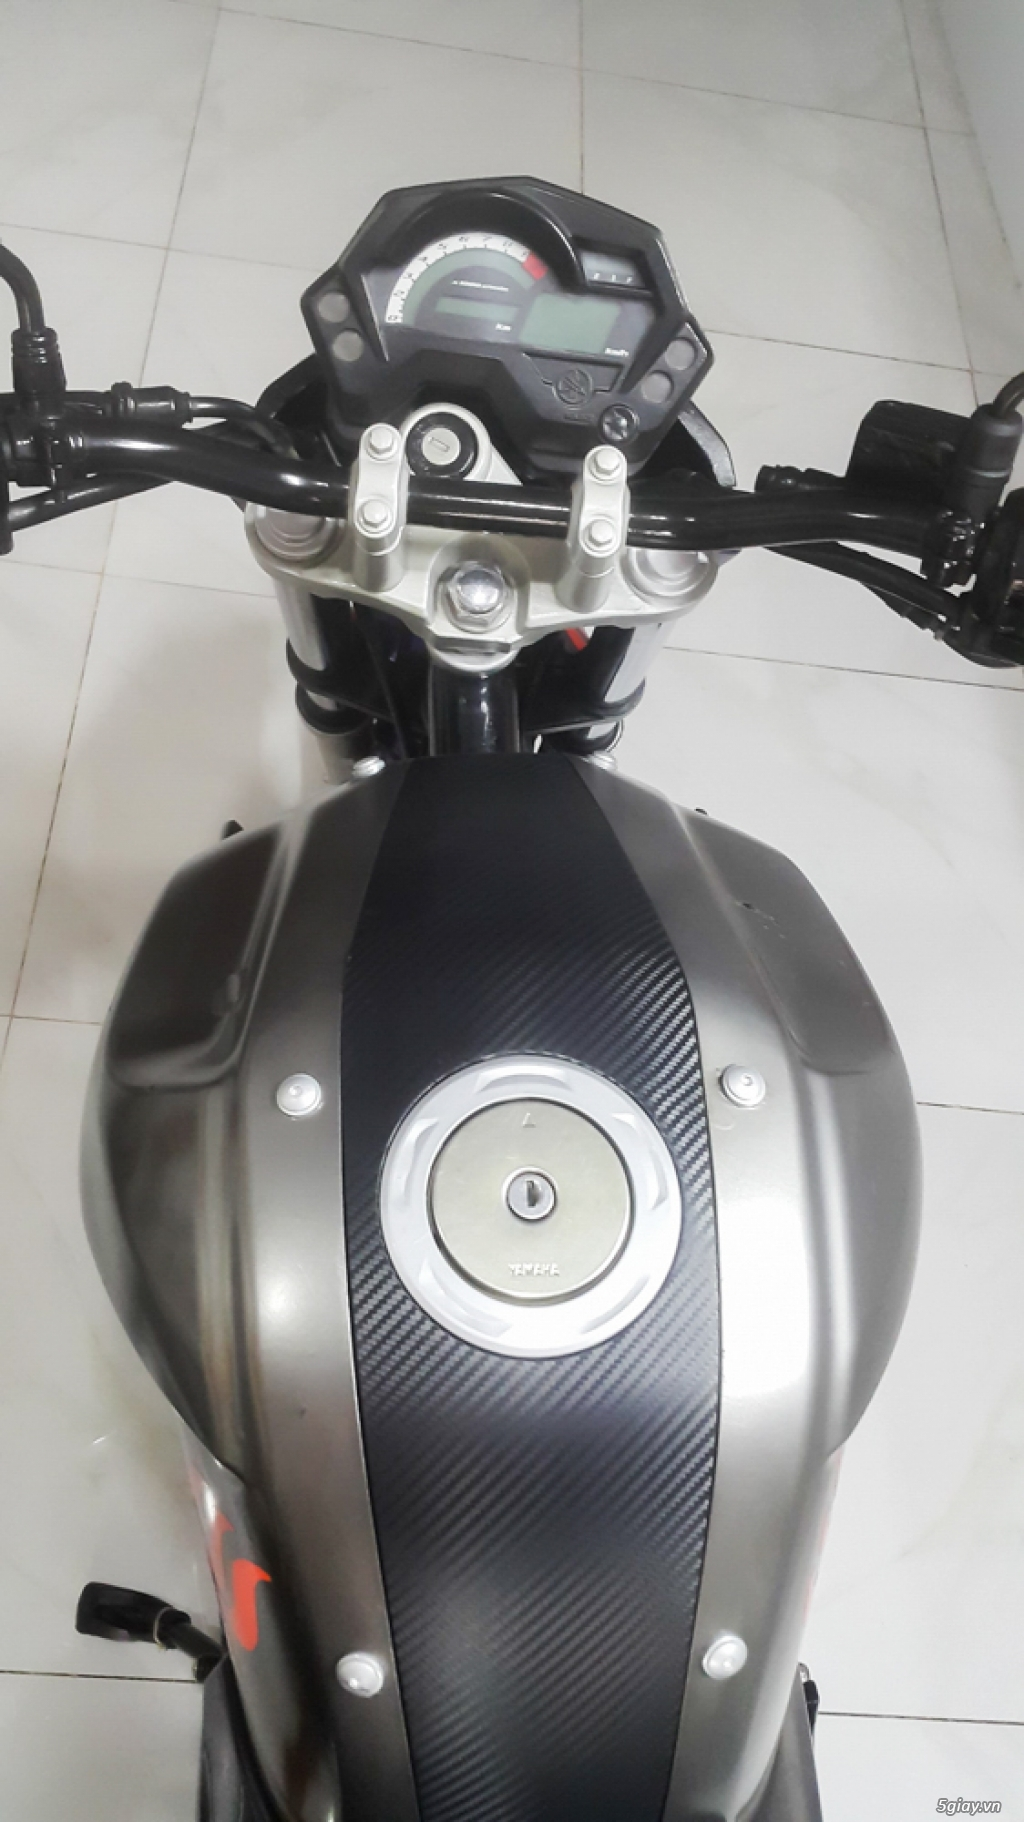 Xe MoTo Yamaha FZ16 153cc HQCN Biển Số Sang - 4